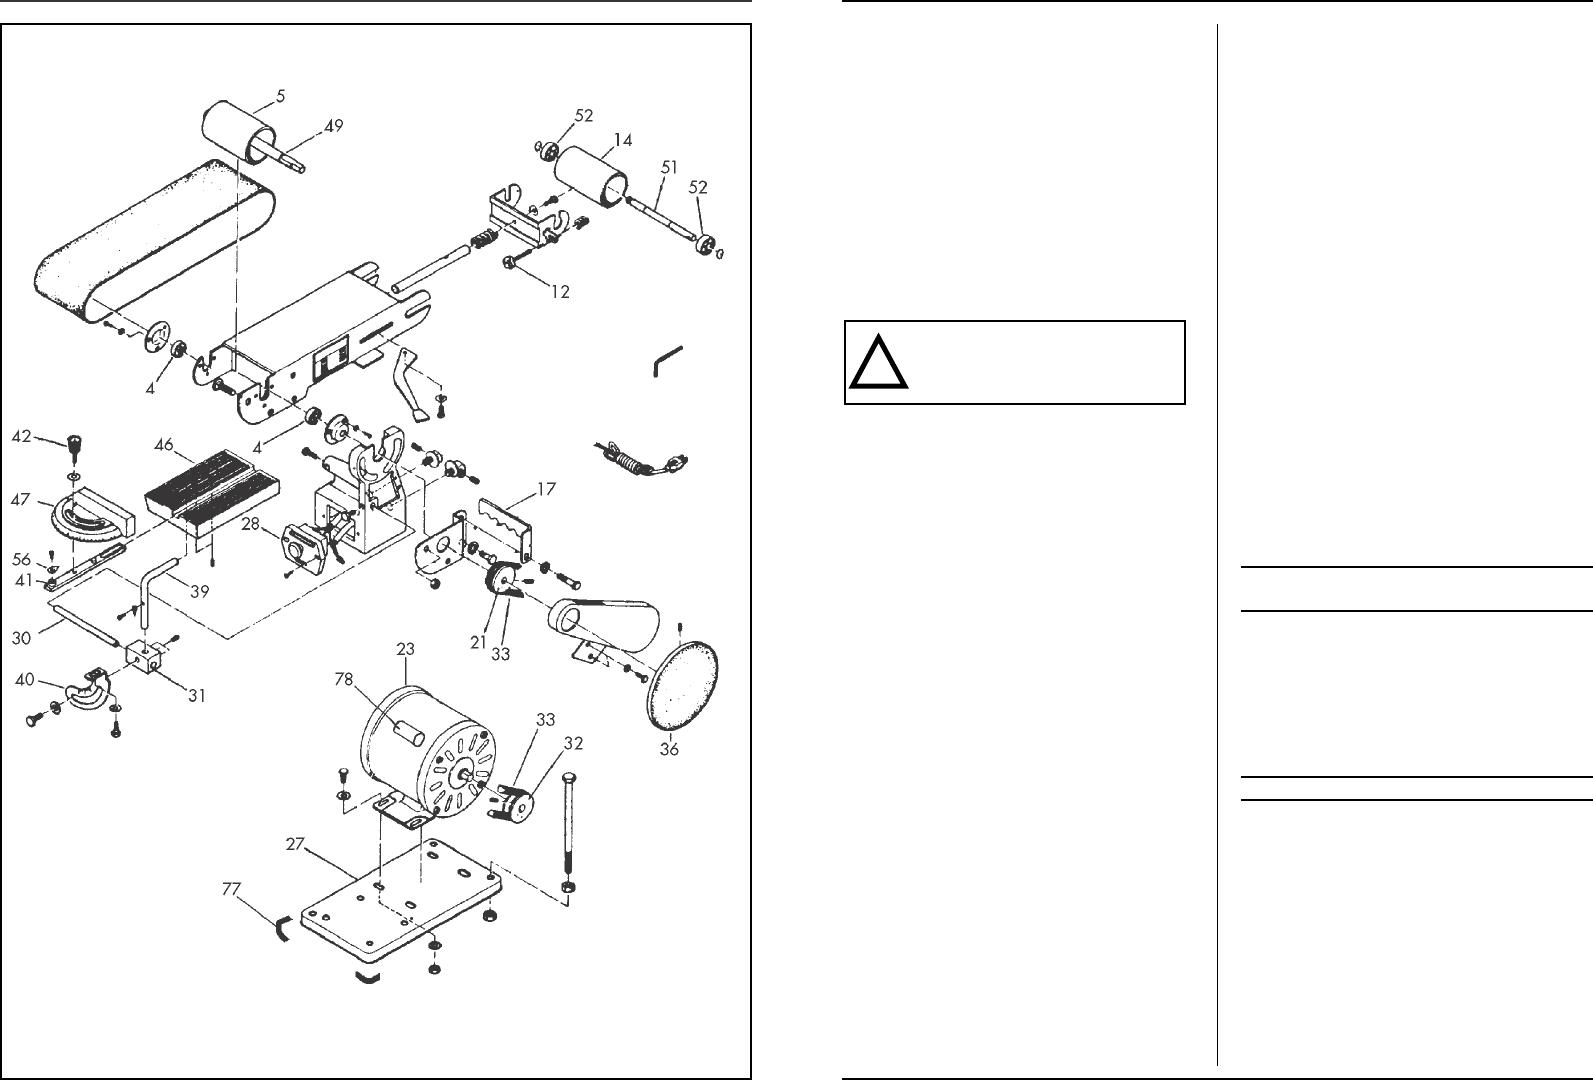 scheppach hm2 kombi owners manual